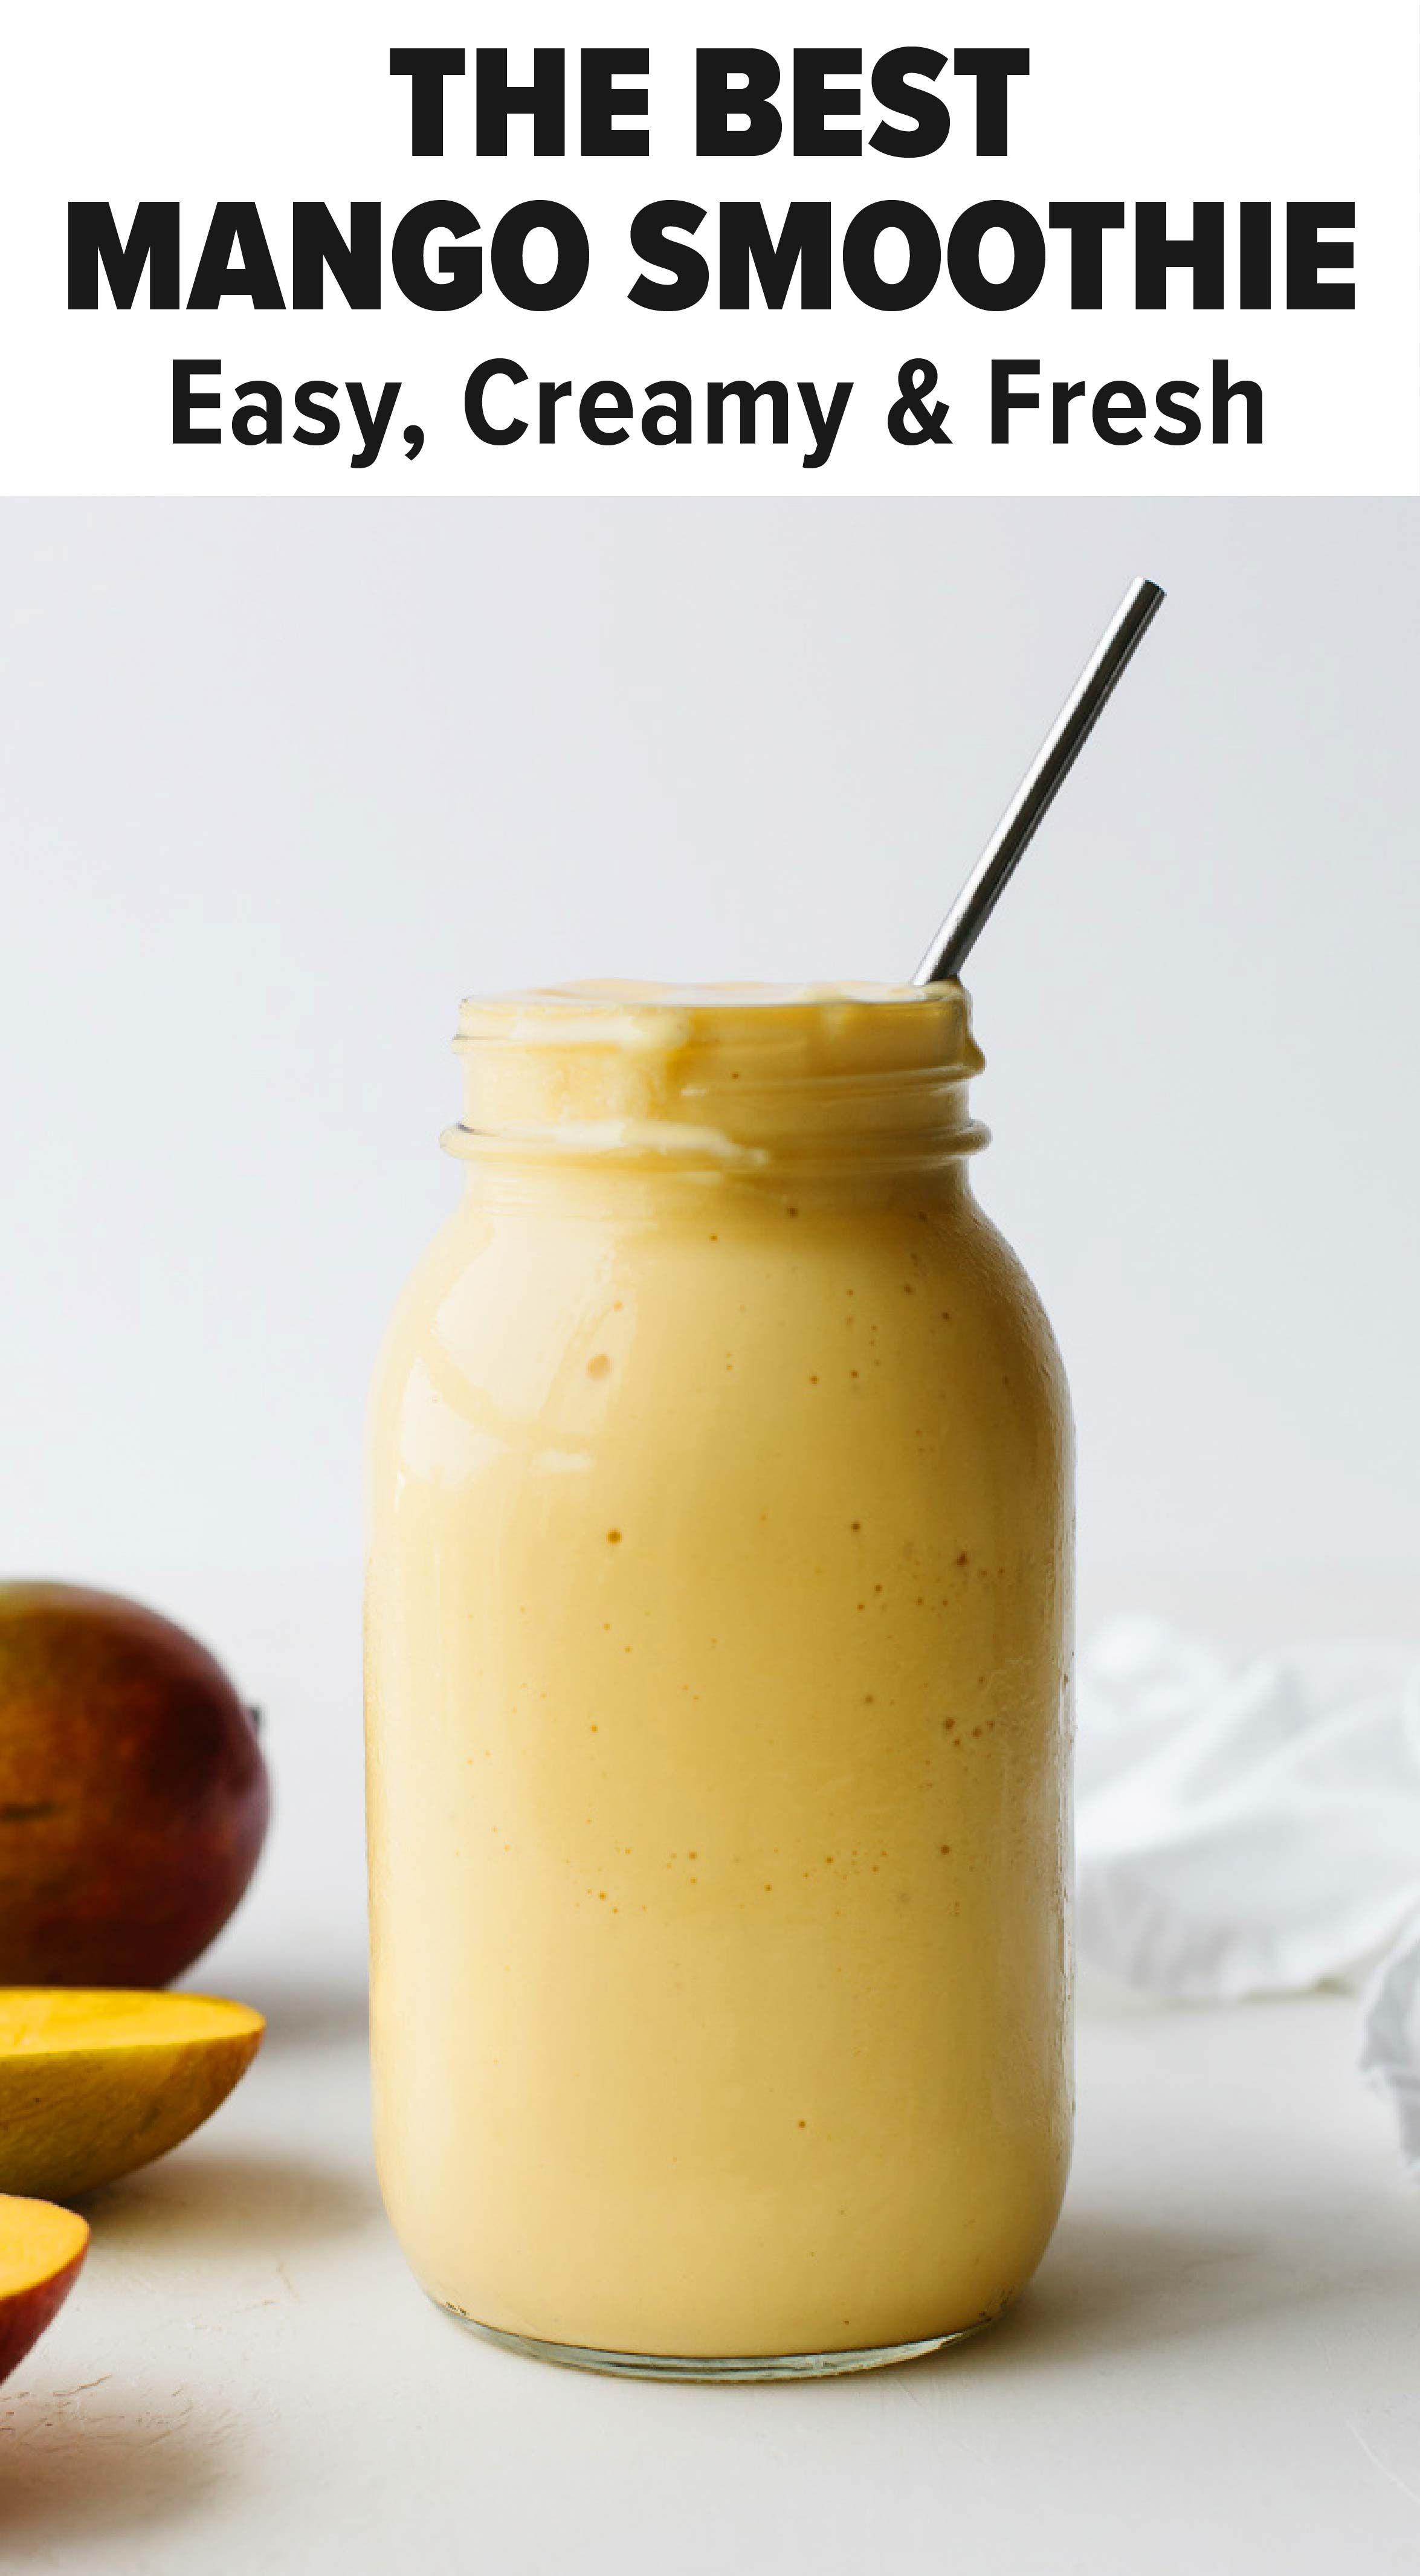 The Best Mango Smoothie Smoothie Recipes Healthy Breakfast Mango Smoothie Recipes Easy Smoothie Recipes